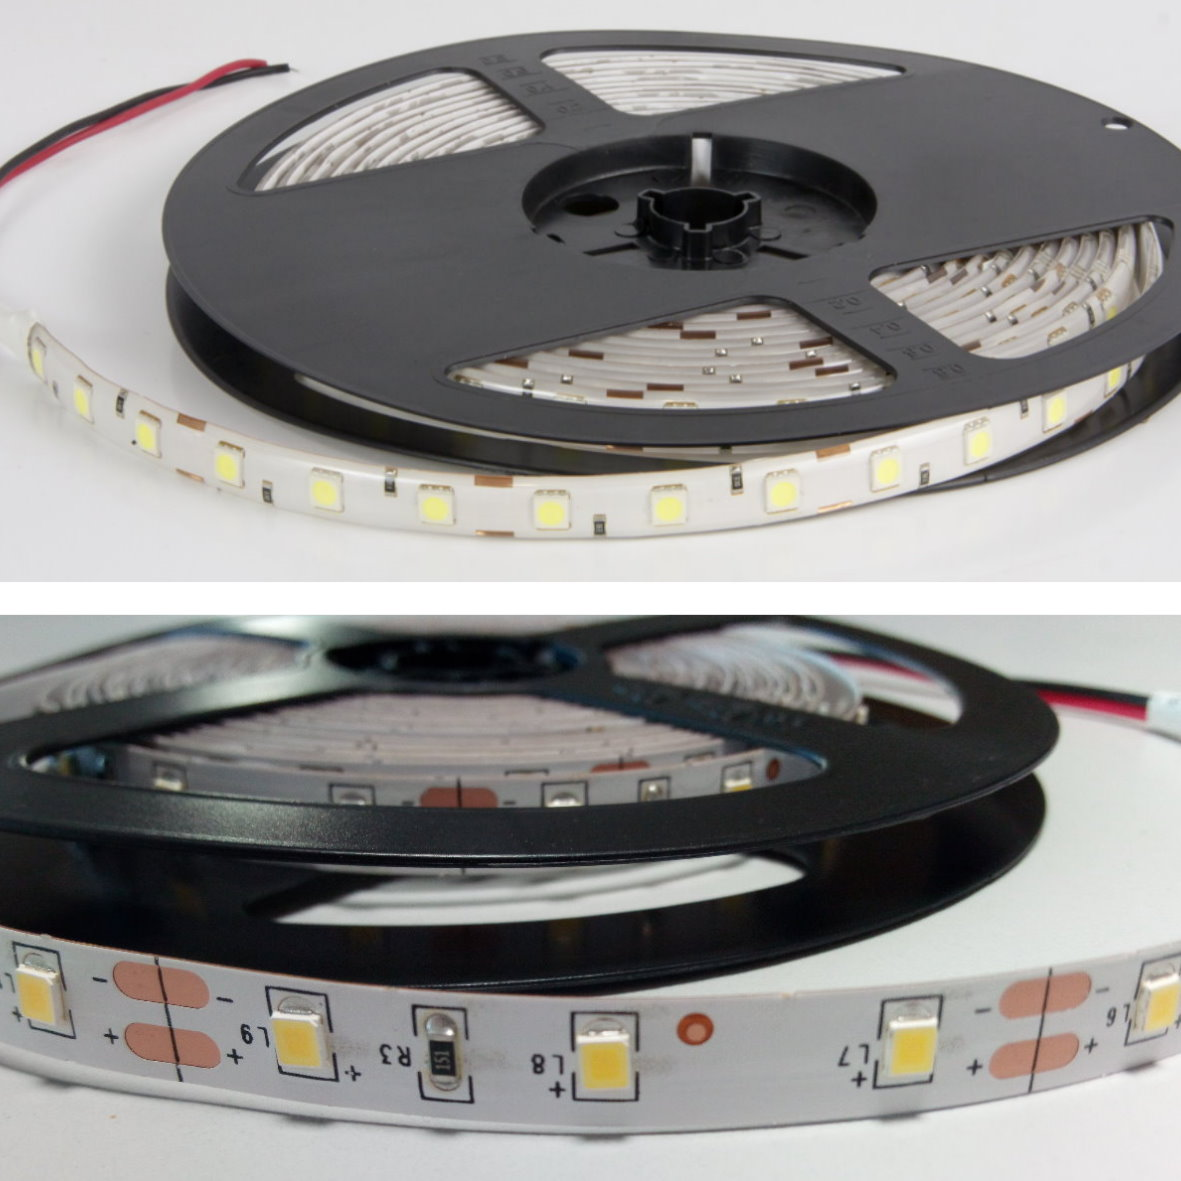 6 98 eur m 5m led lichtband 72w ip65 dimmbar warmwei 300x 5050 aussen stripe. Black Bedroom Furniture Sets. Home Design Ideas